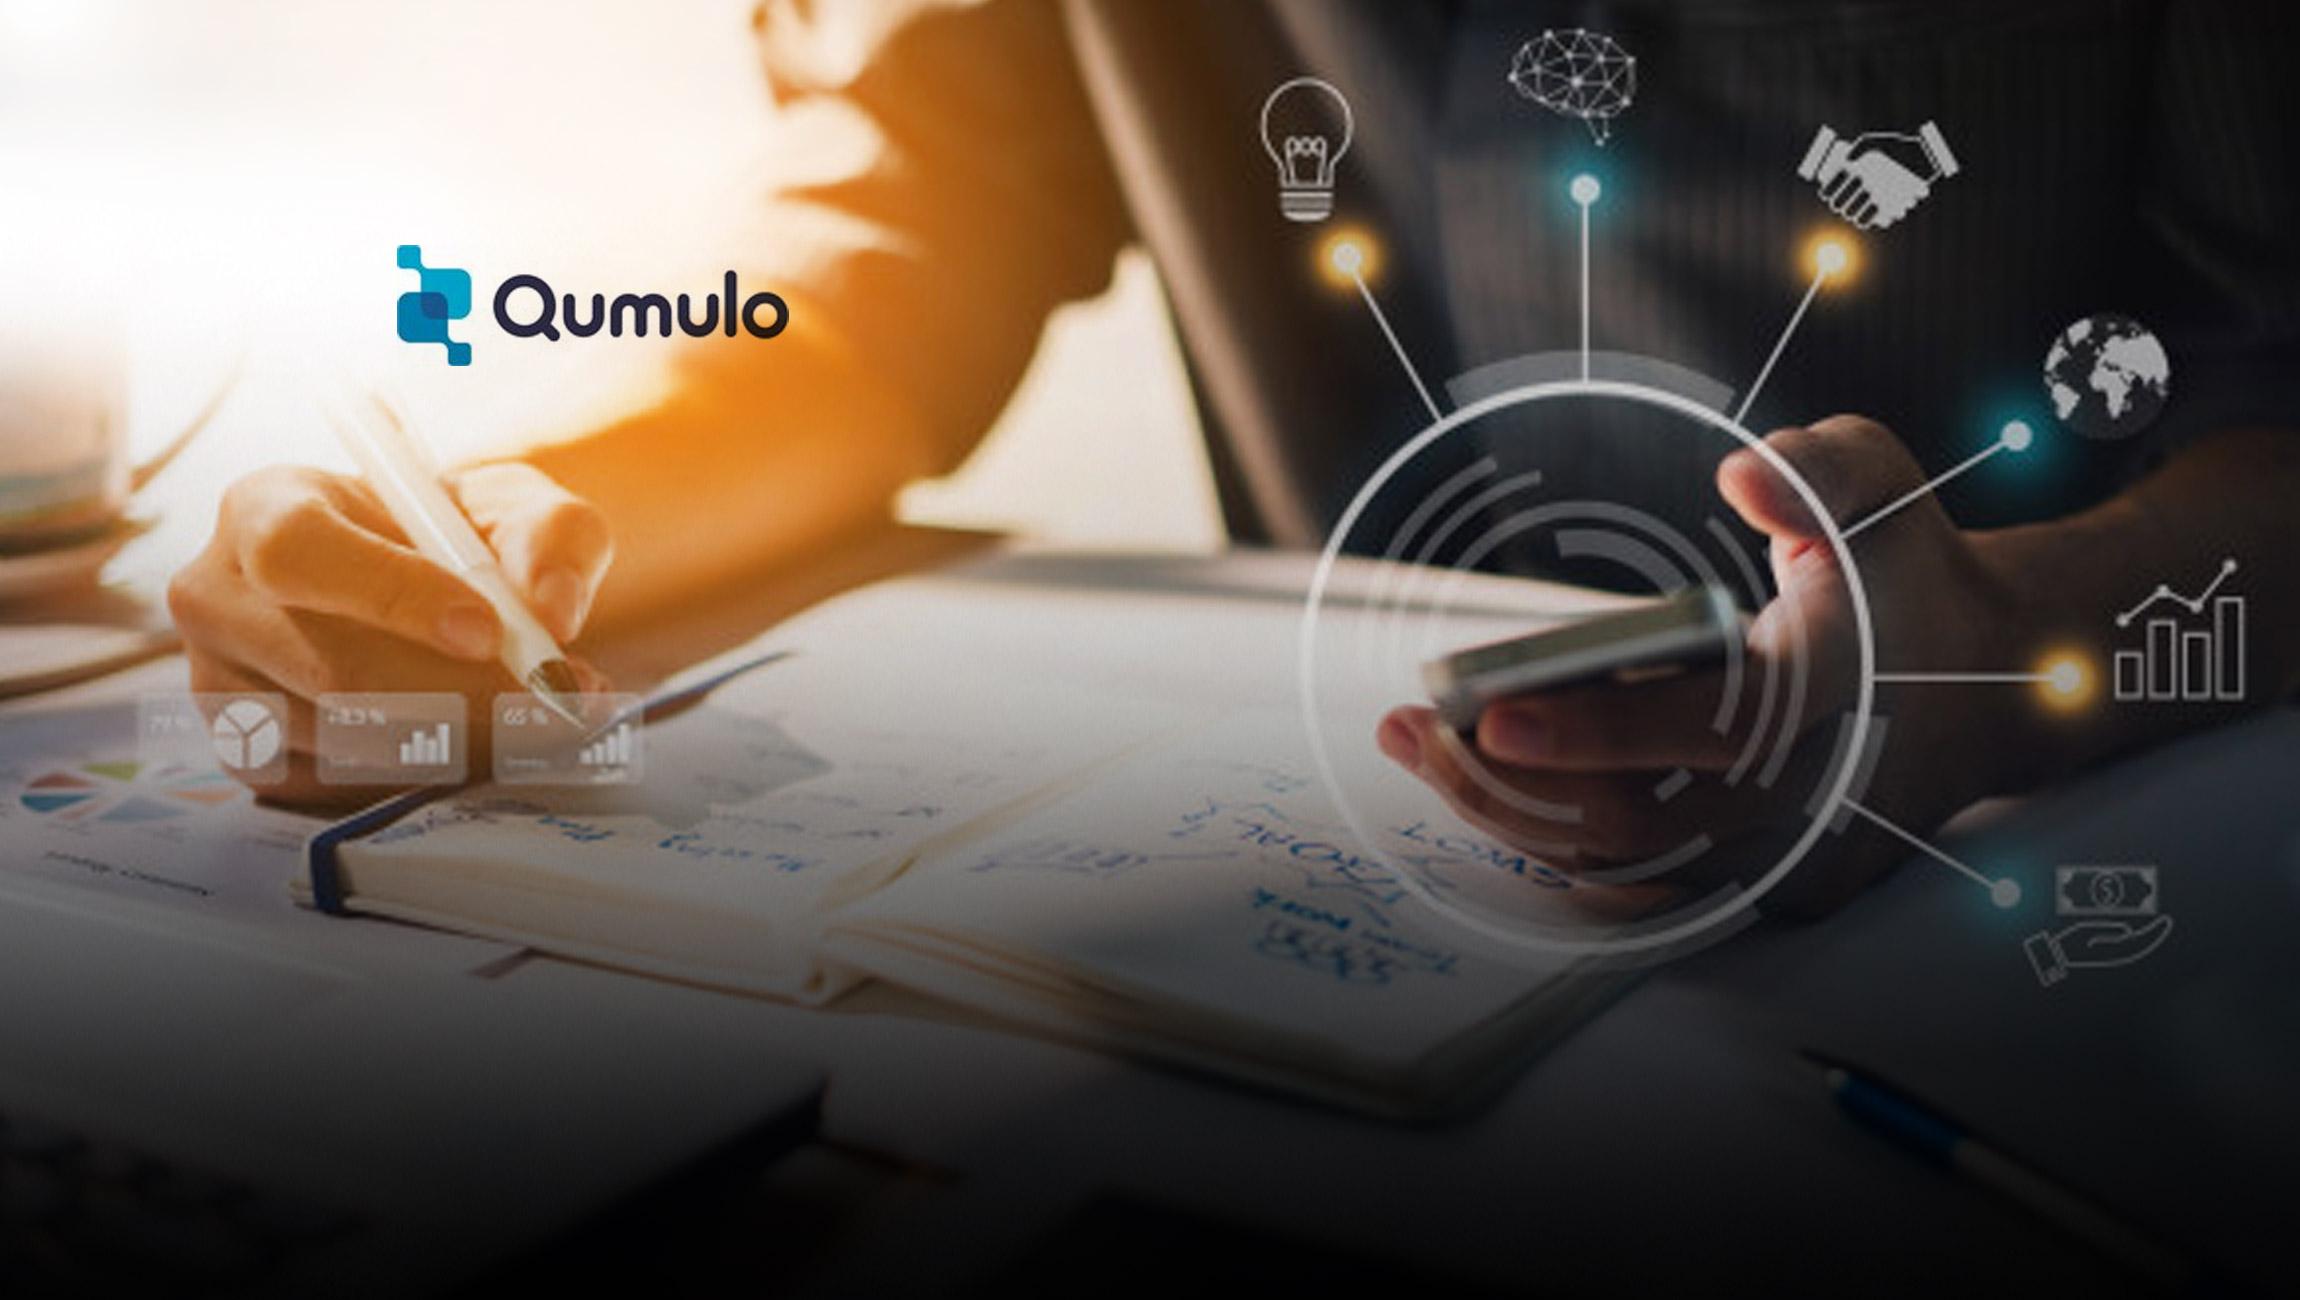 Qumulo Announces Native Support for Amazon Nimble Studio